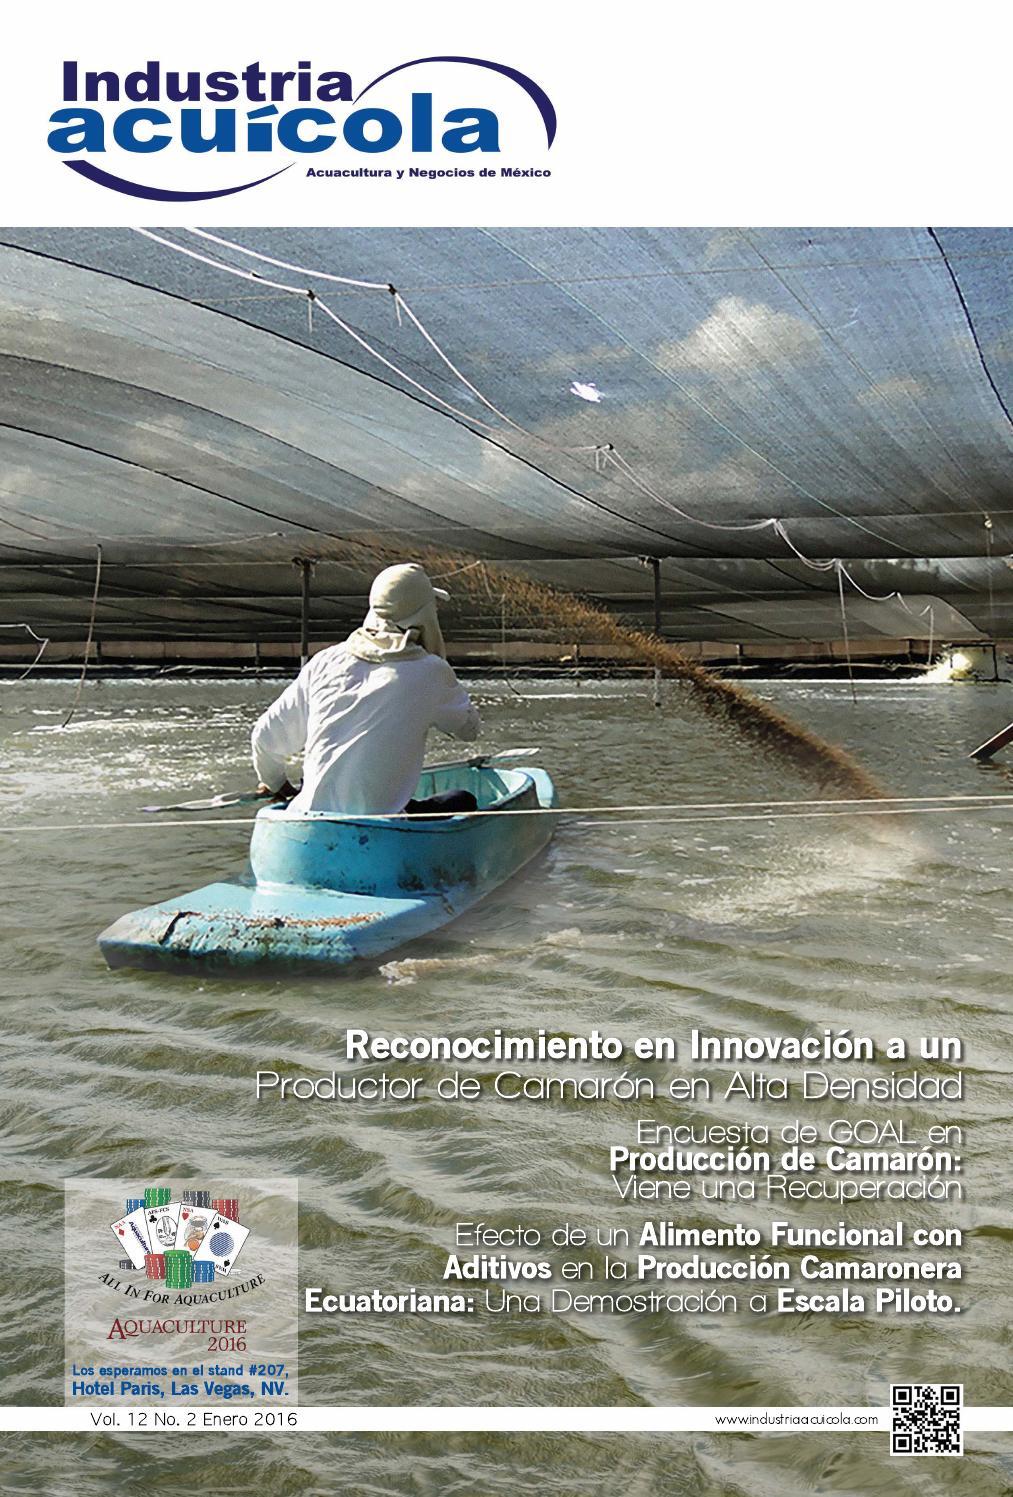 Revista industria acu cola 12 2 by aqua negocios sa de cv for Engorda de tilapia en estanques rusticos